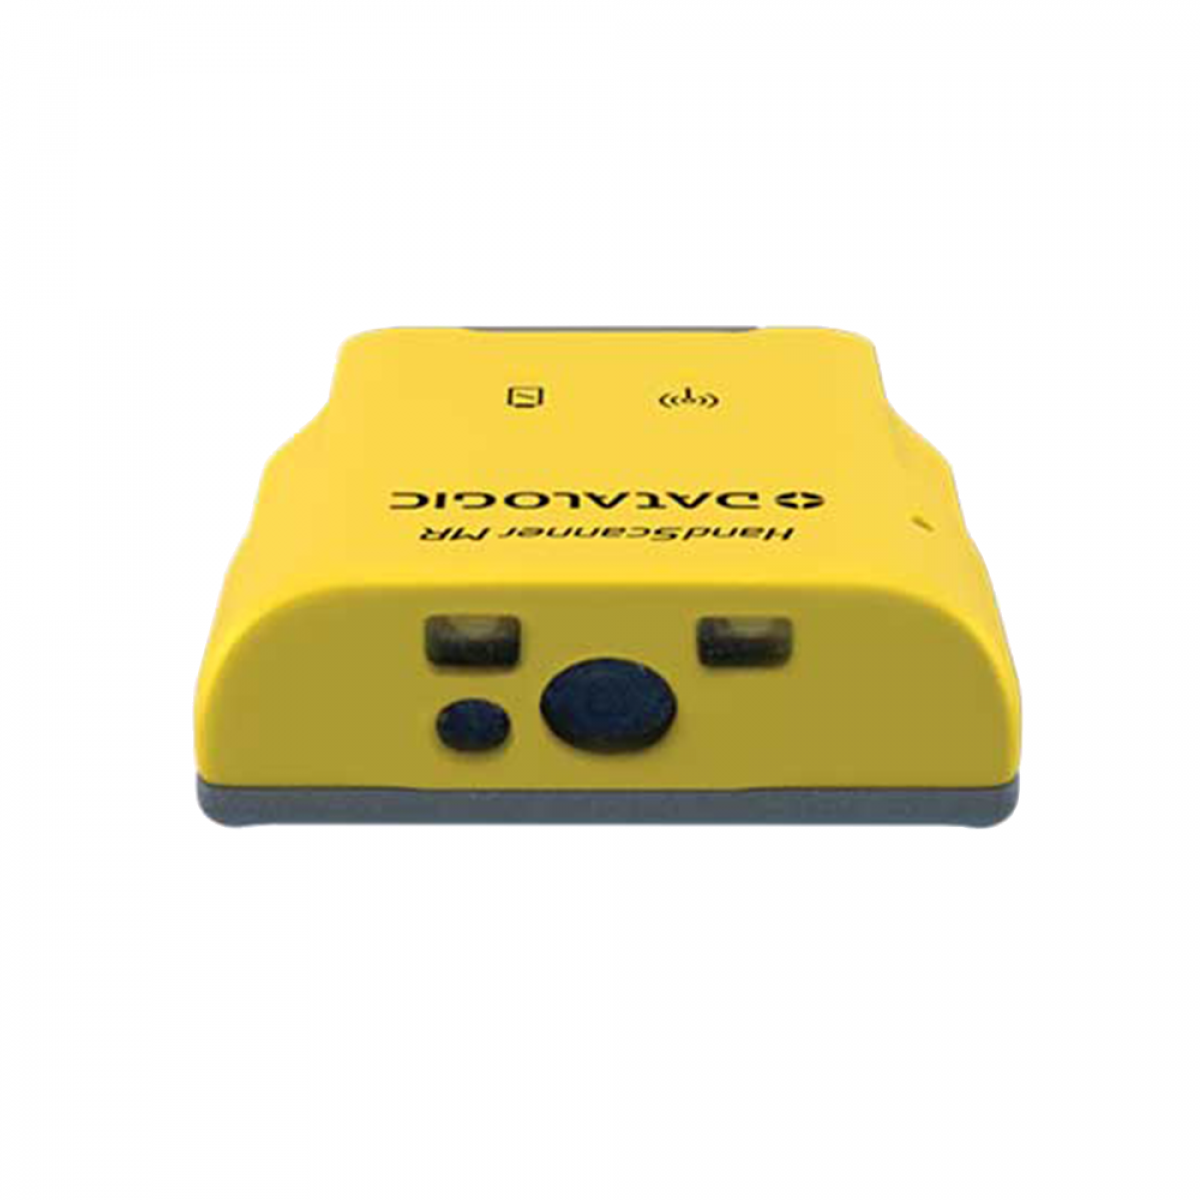 Datalogic Handscanner - wearable data capture hardware